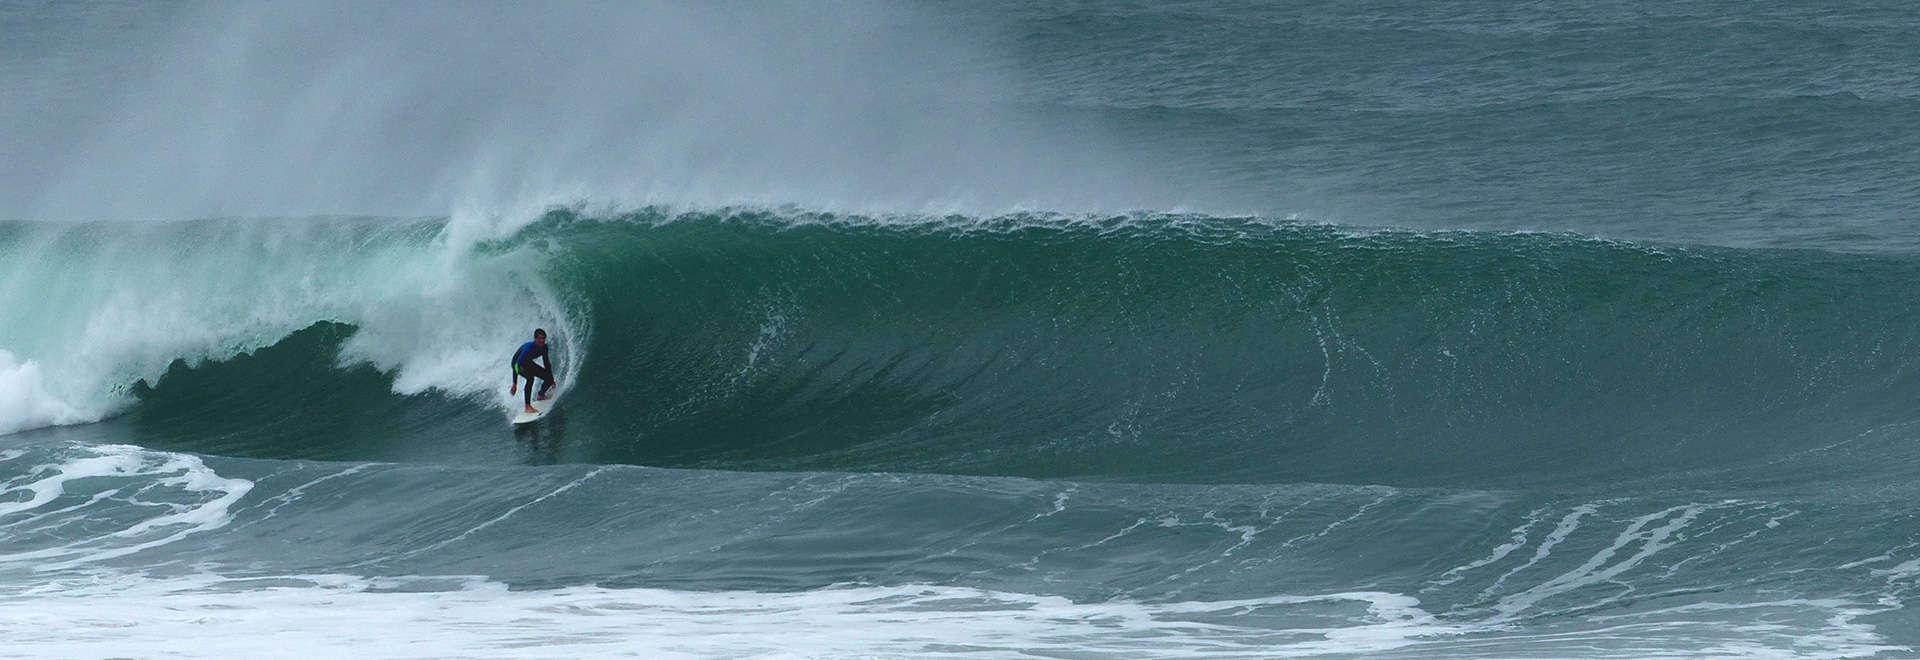 portugal surf guiding lisbon wave off shore